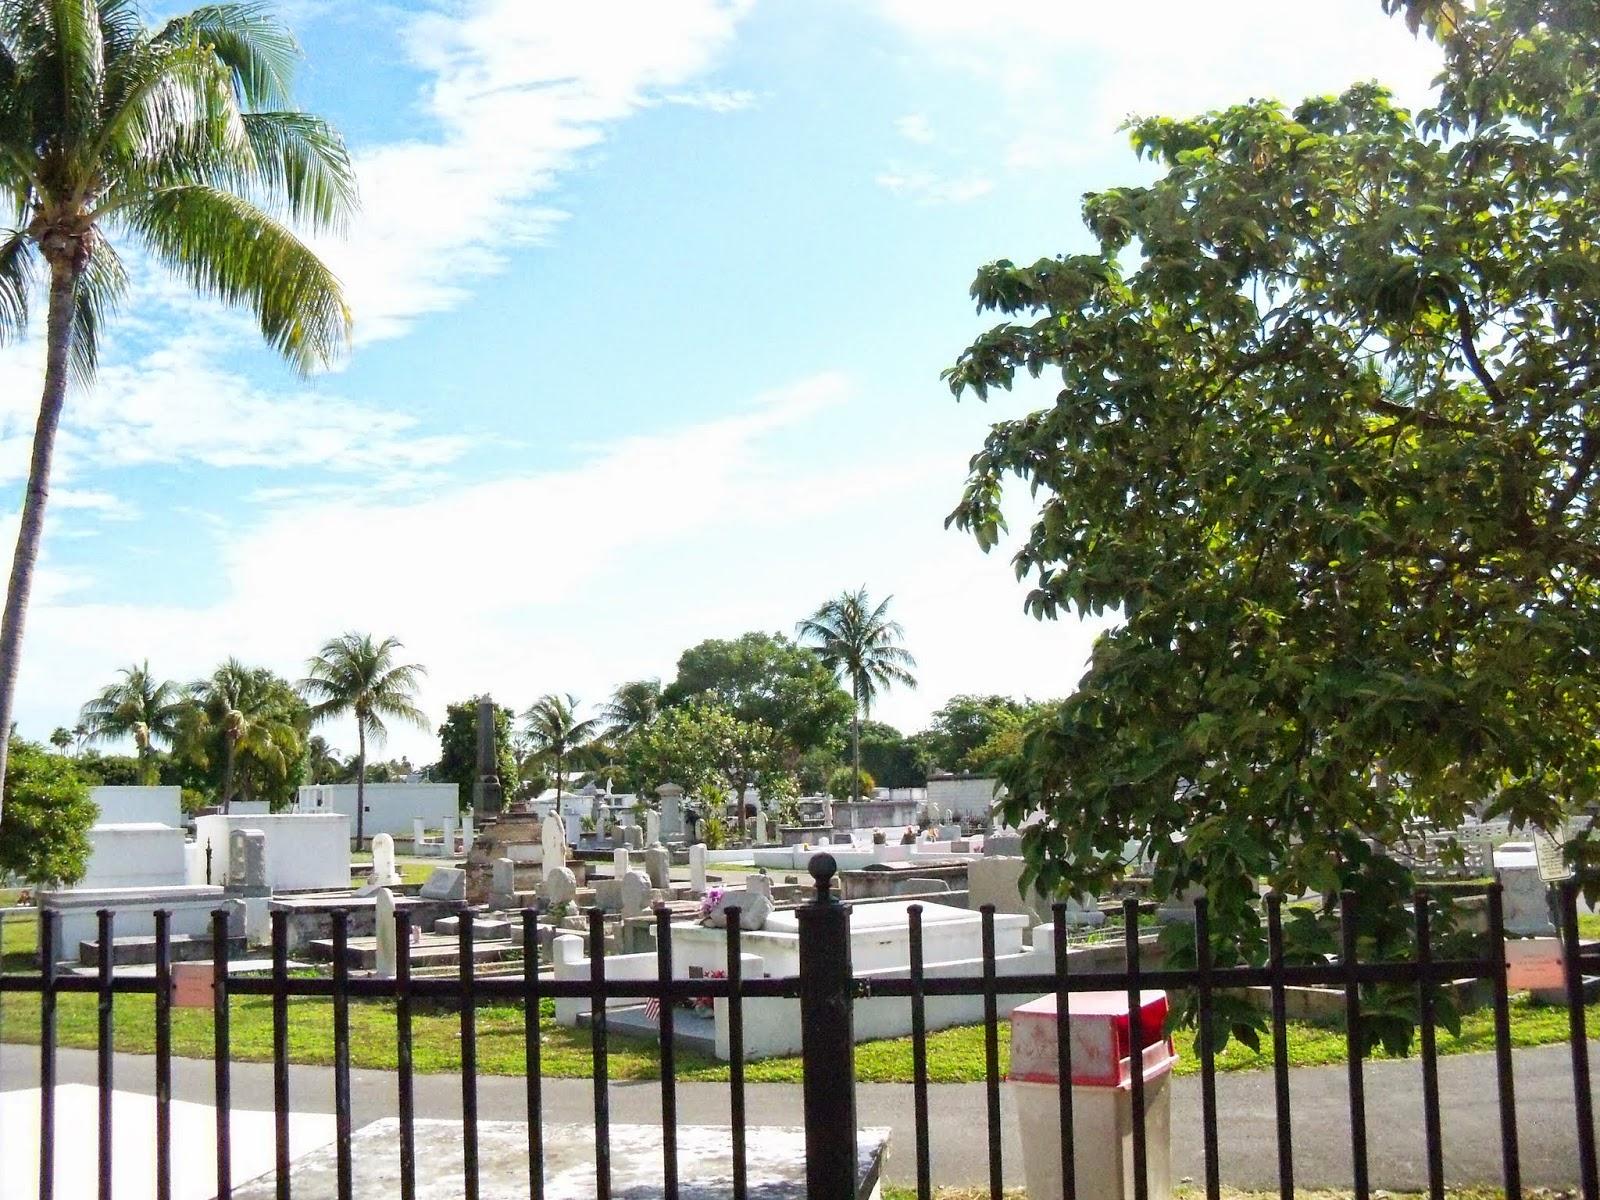 Key West Vacation - 116_5655.JPG